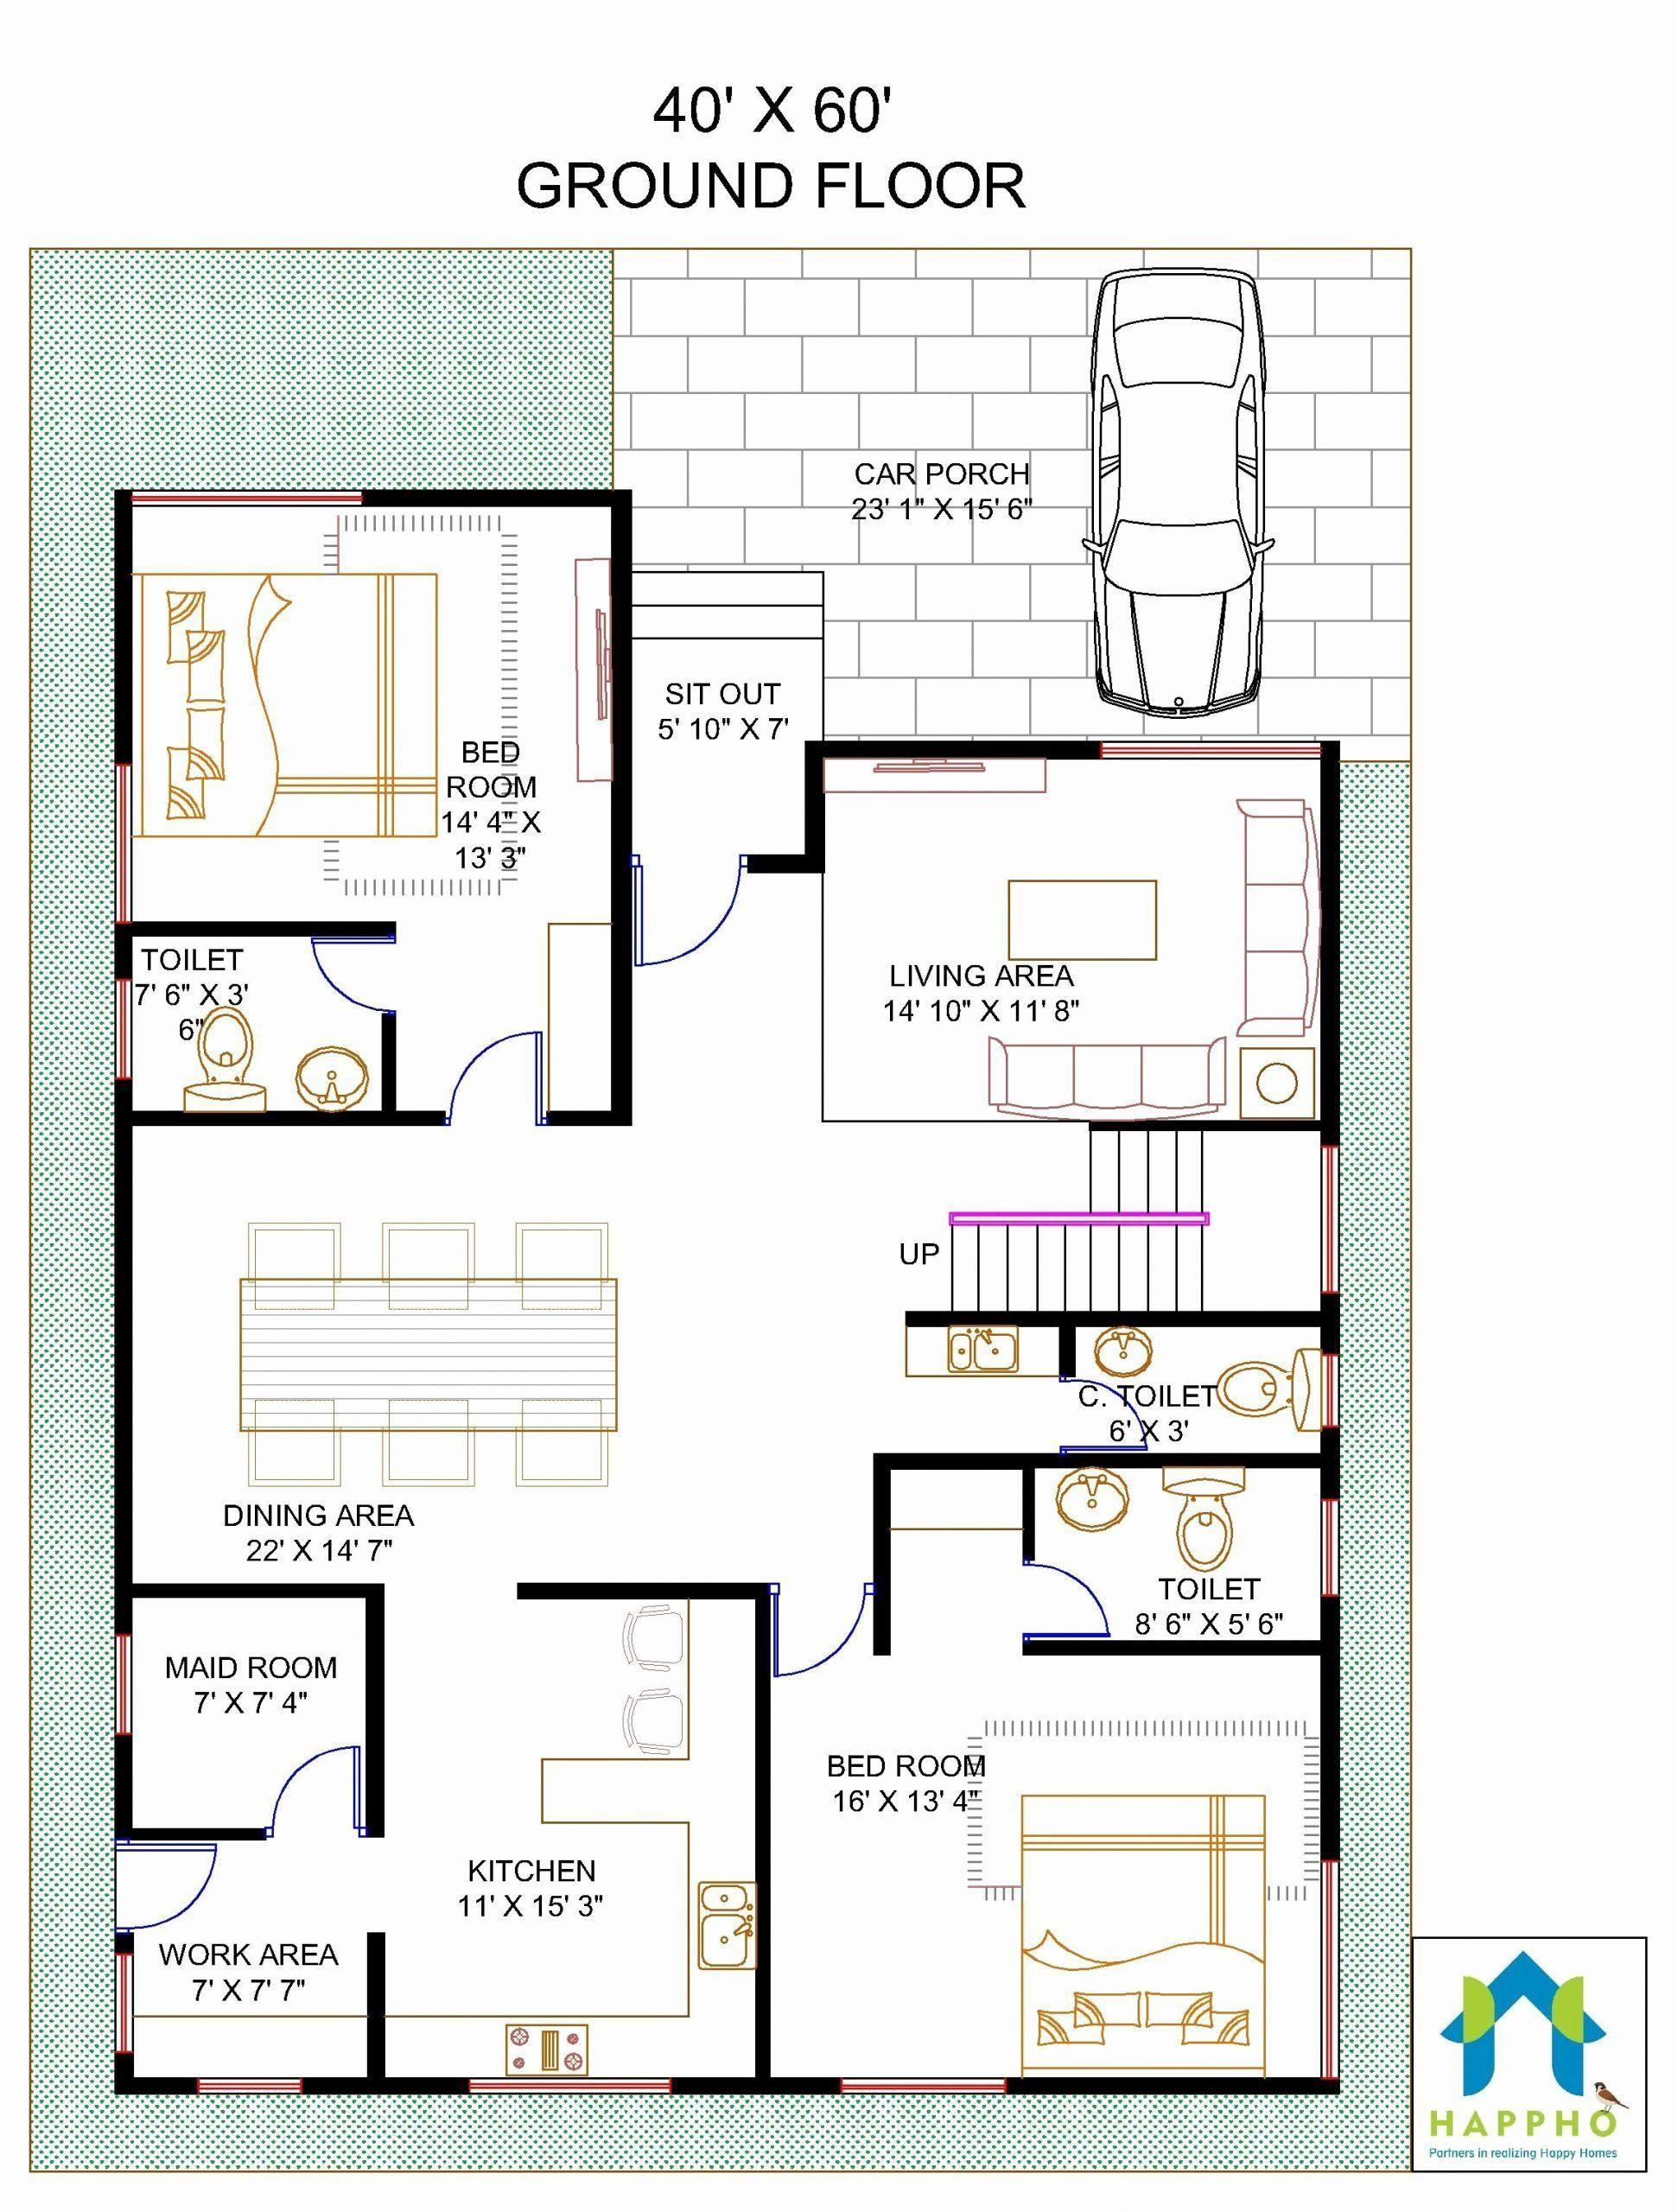 2400 Sq Ft Home Design Elegant Is 2400 Sqft Sufficient For 6 Bhk House Nopalnapi In 2021 Square House Plans Unique Floor Plans Beautiful House Plans